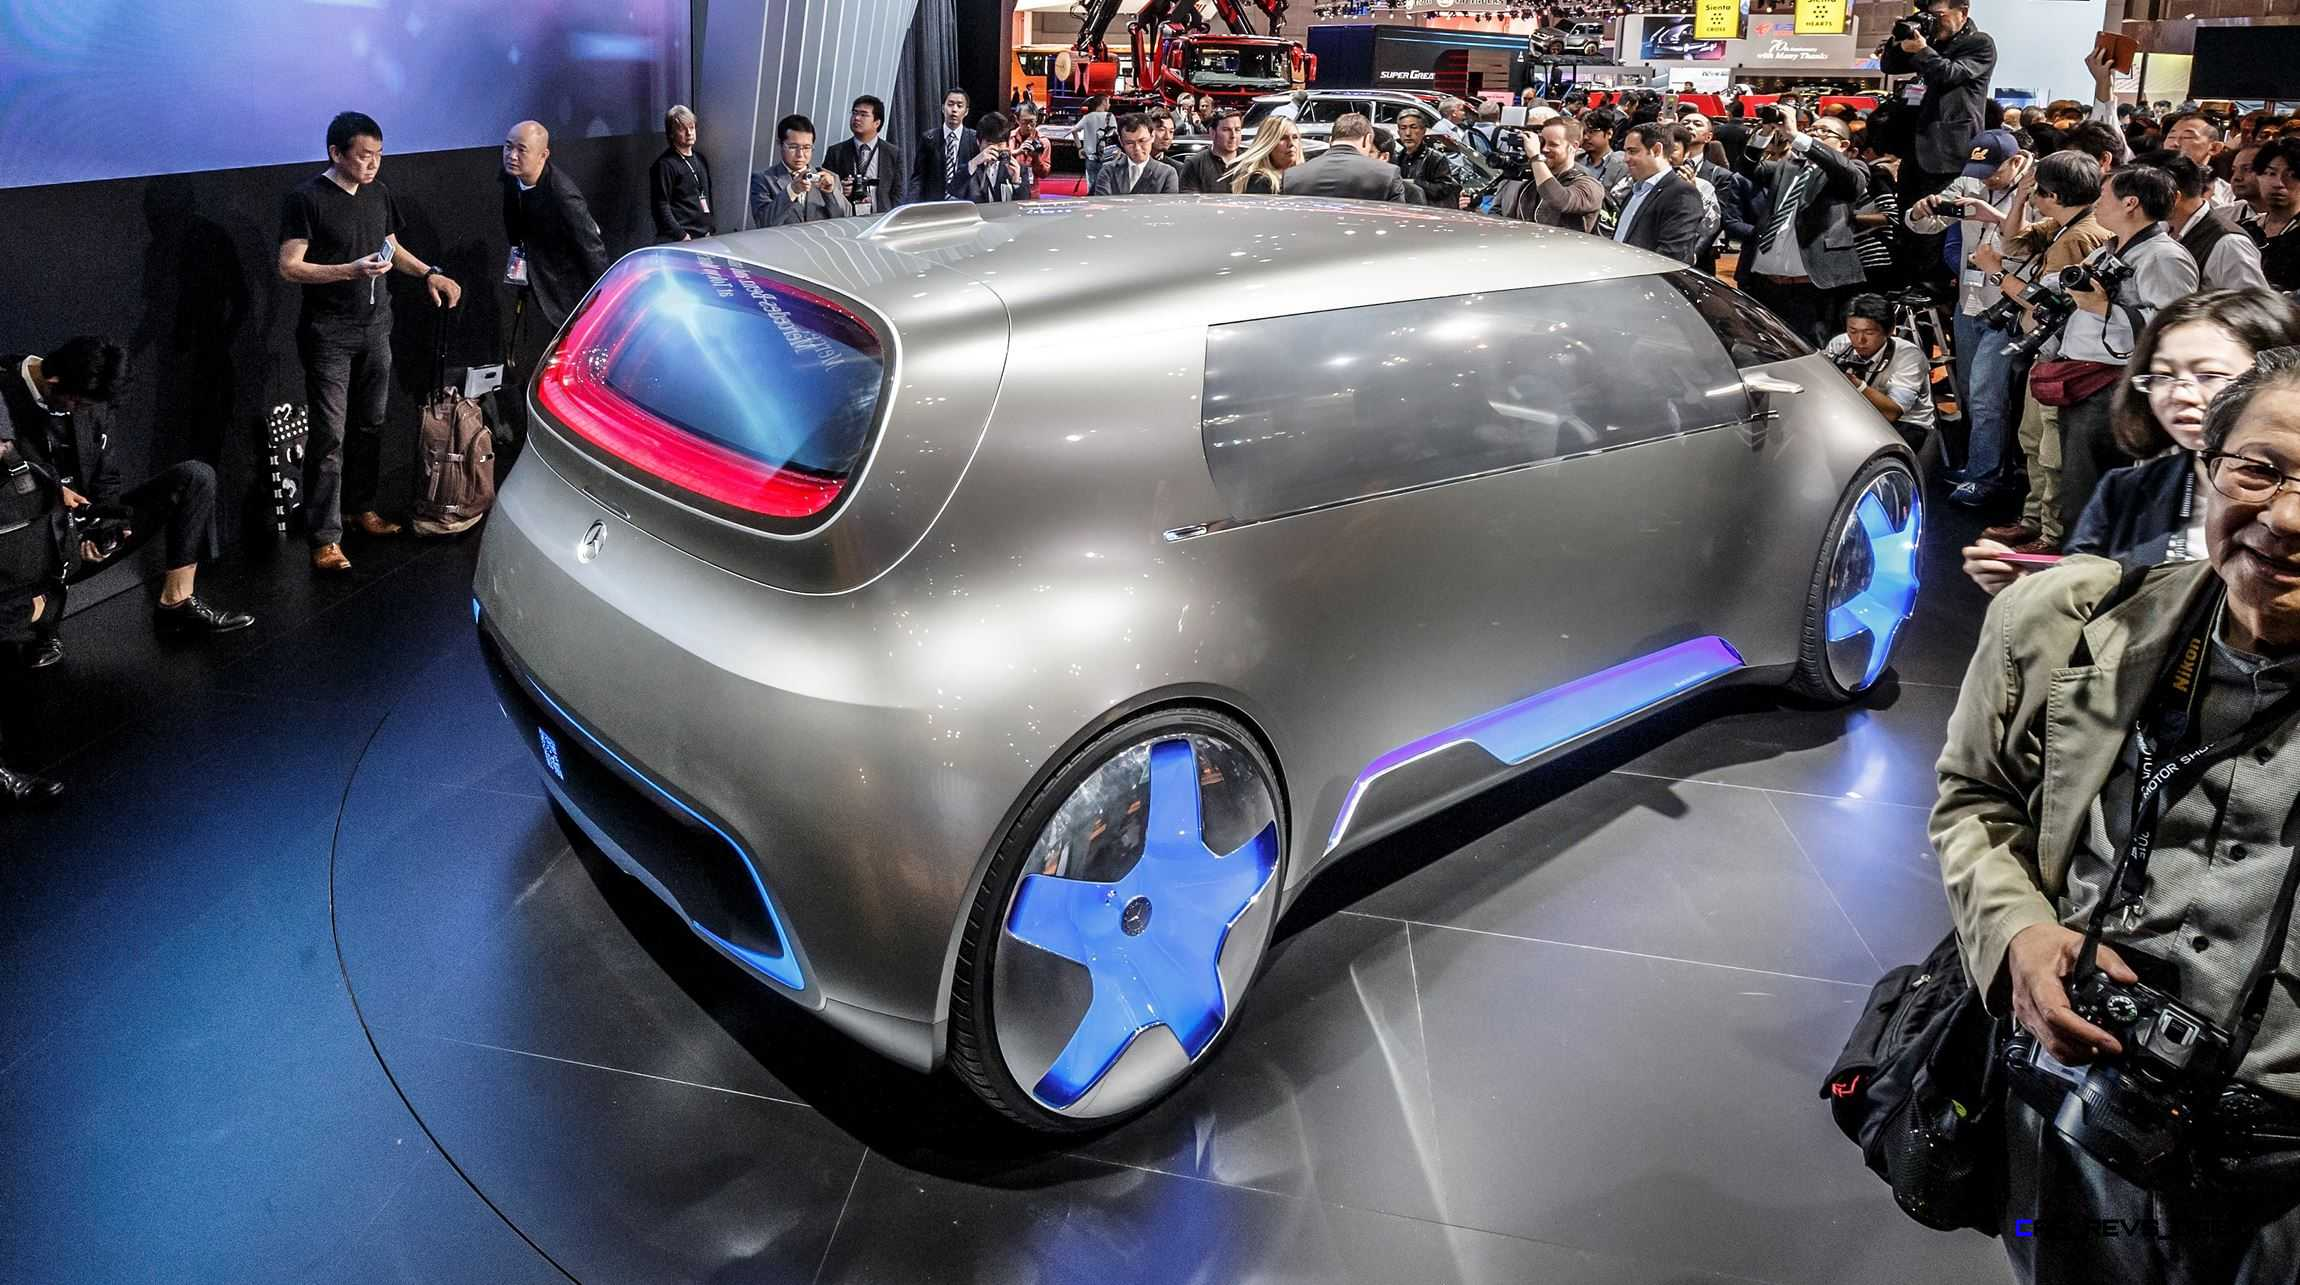 http://www.car-revs-daily.com/wp-content/uploads/2015/10/2015-Mercedes-Benz-Vision-Tokyo-23.jpg